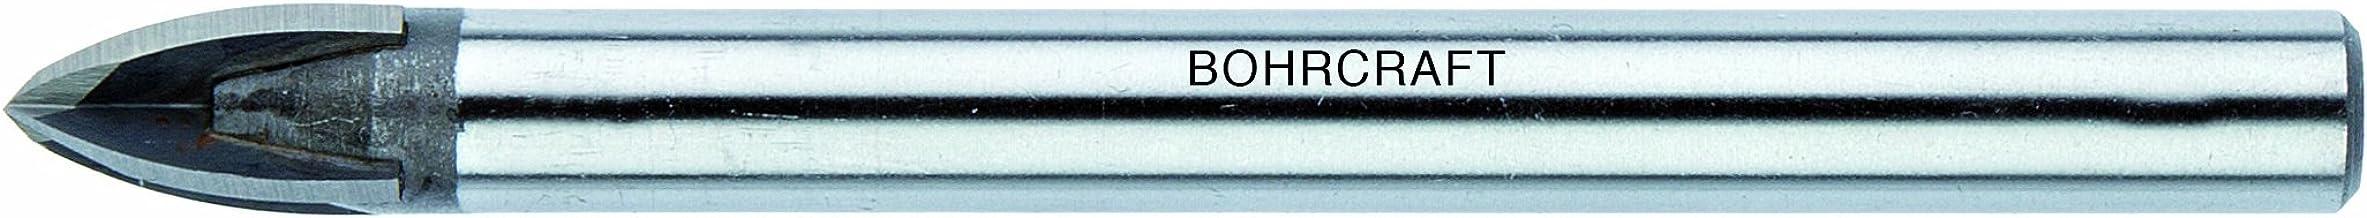 508600 PROJAHN Steinbohrer ECO 8x600 mm